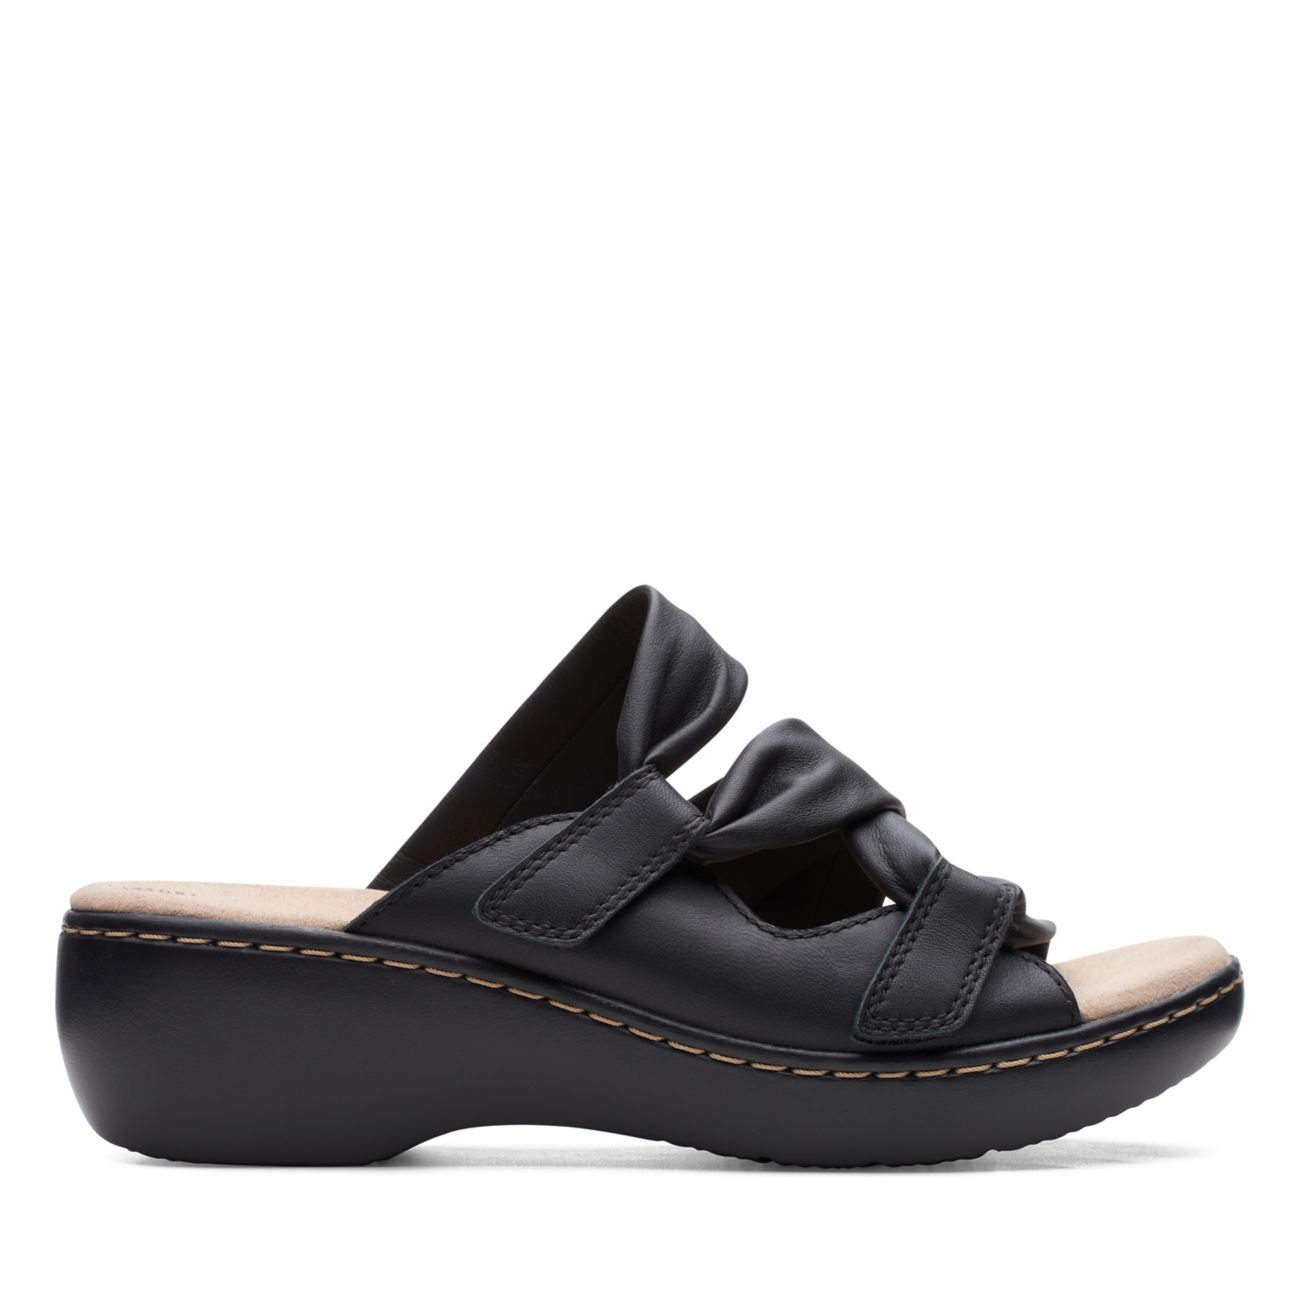 Delana Jazz Black Leather - Clarks® Shoes Official Site | Clarks